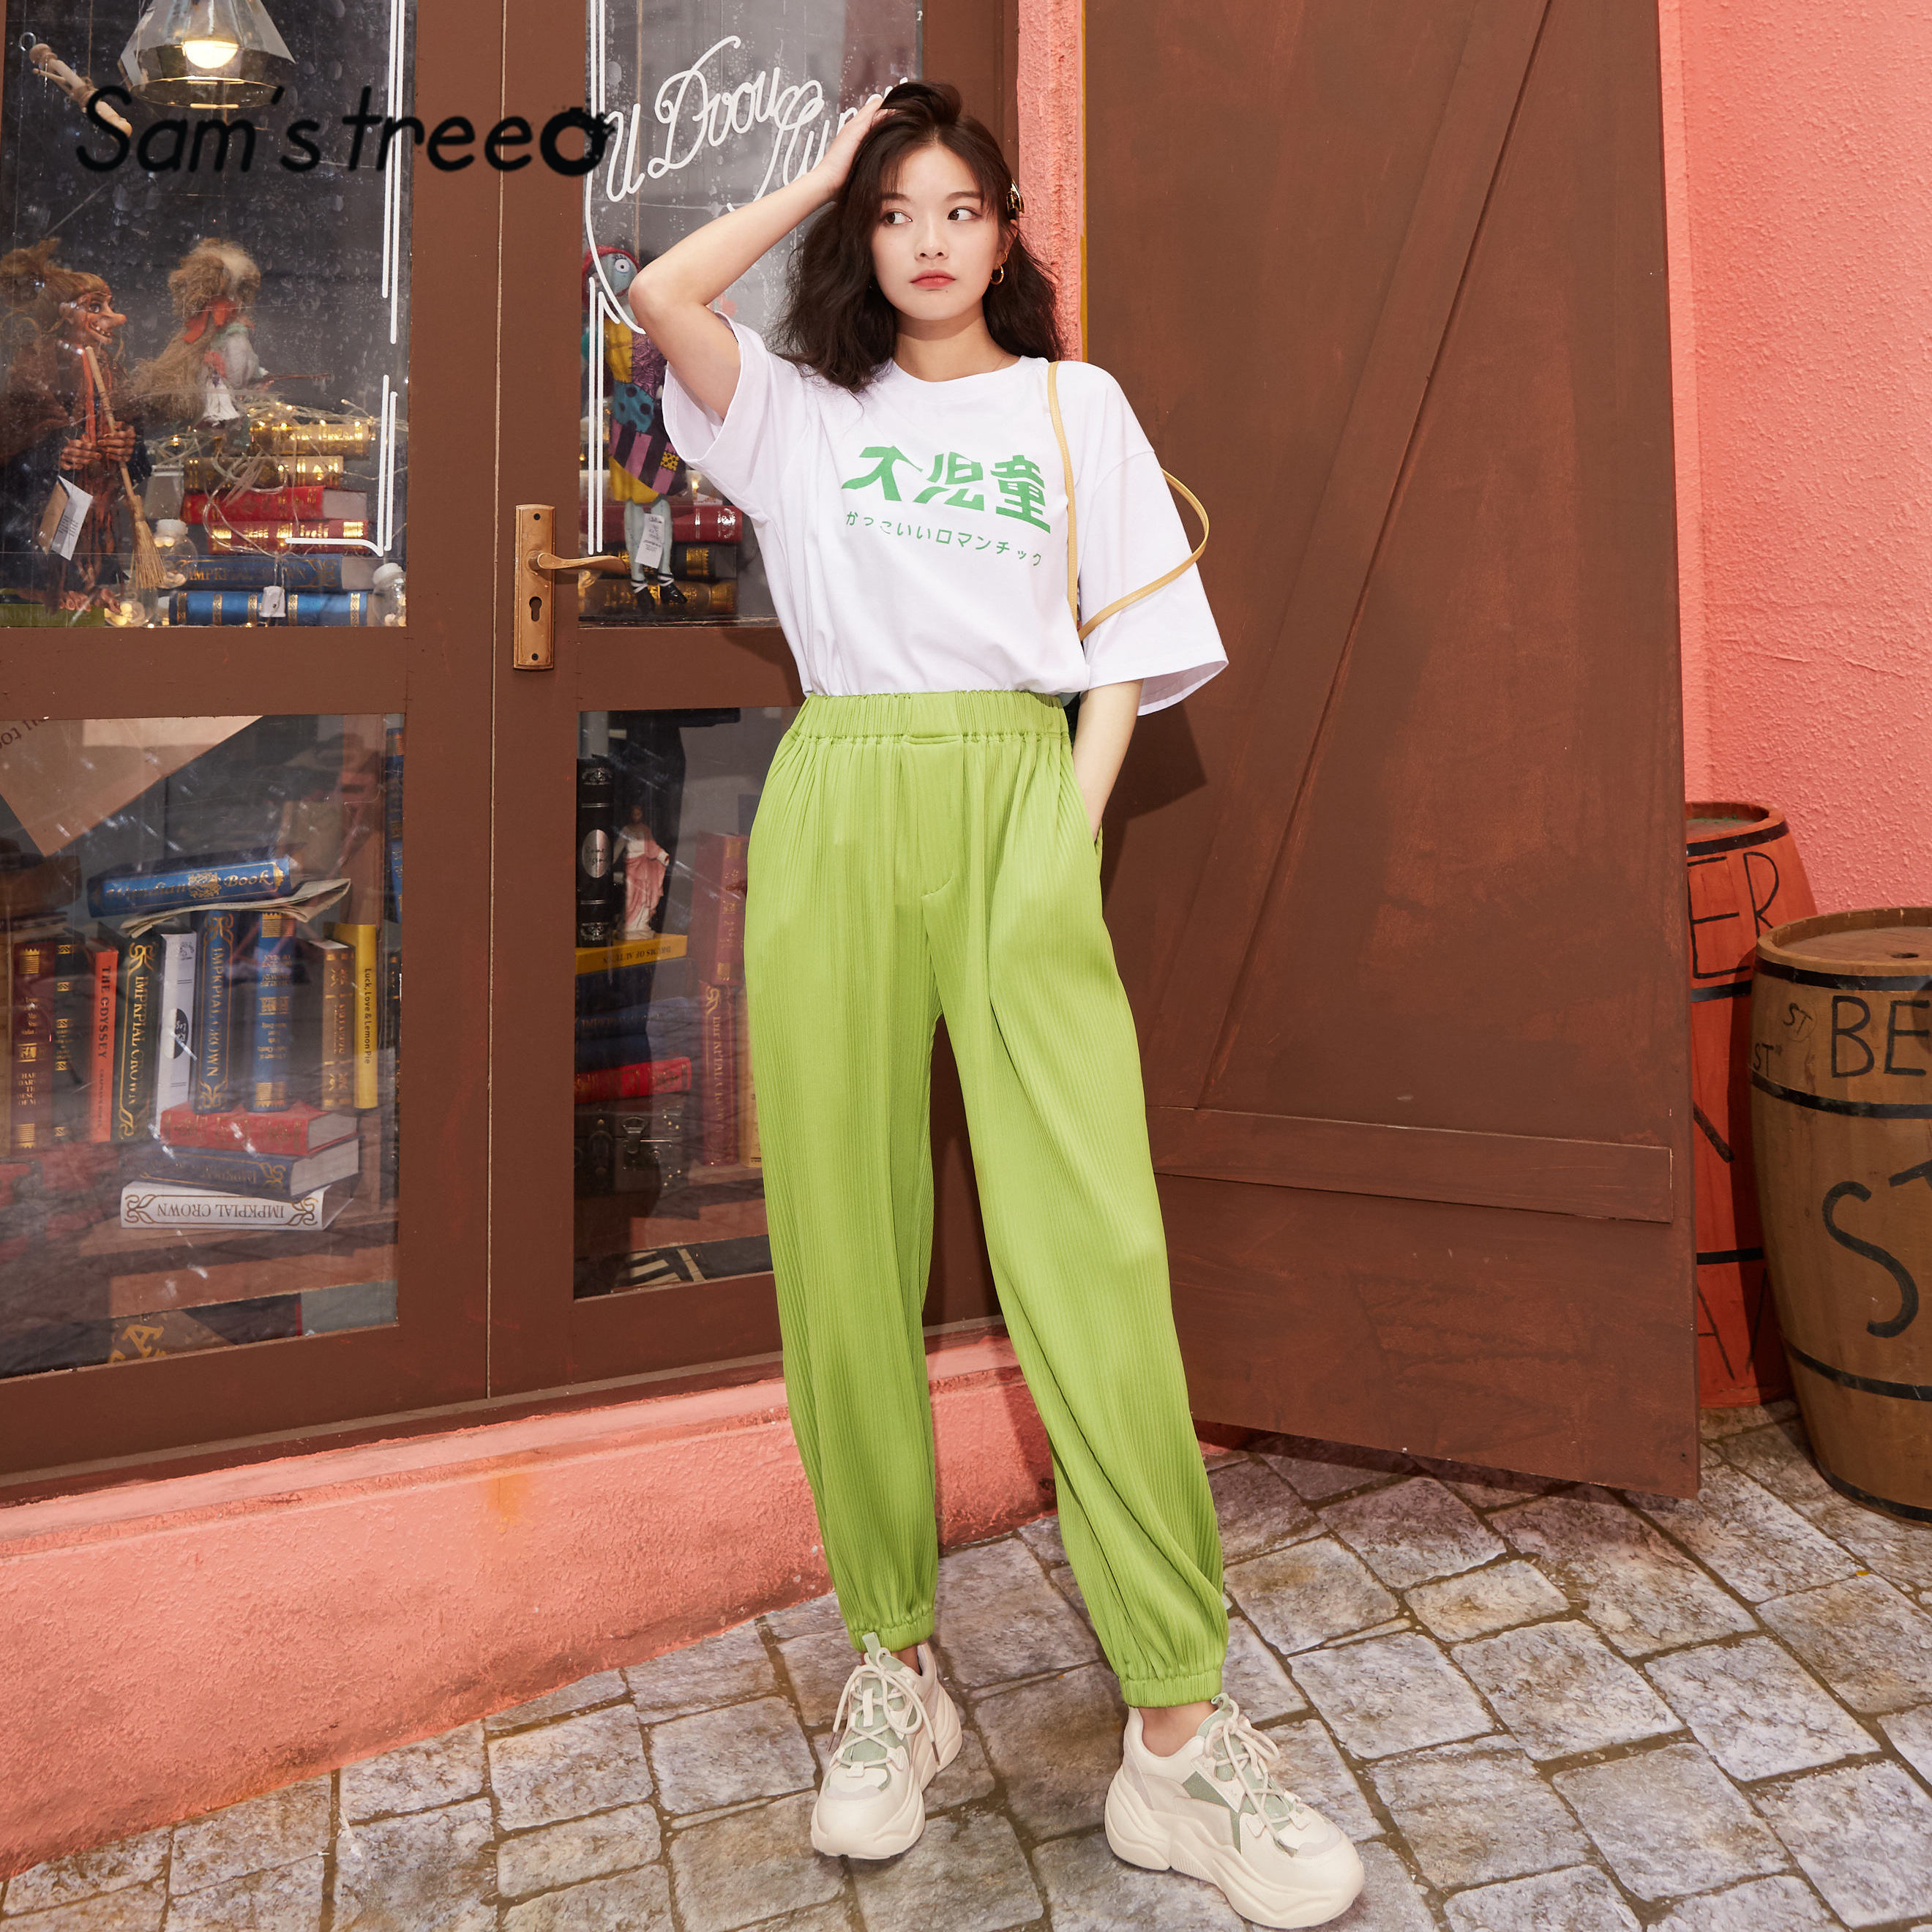 SAM'S TREE Green Solid Minimalist Straight Casual Women Pants 2020 Spring Black Pure Elastic Waist Korean Ladies Daily Trouser